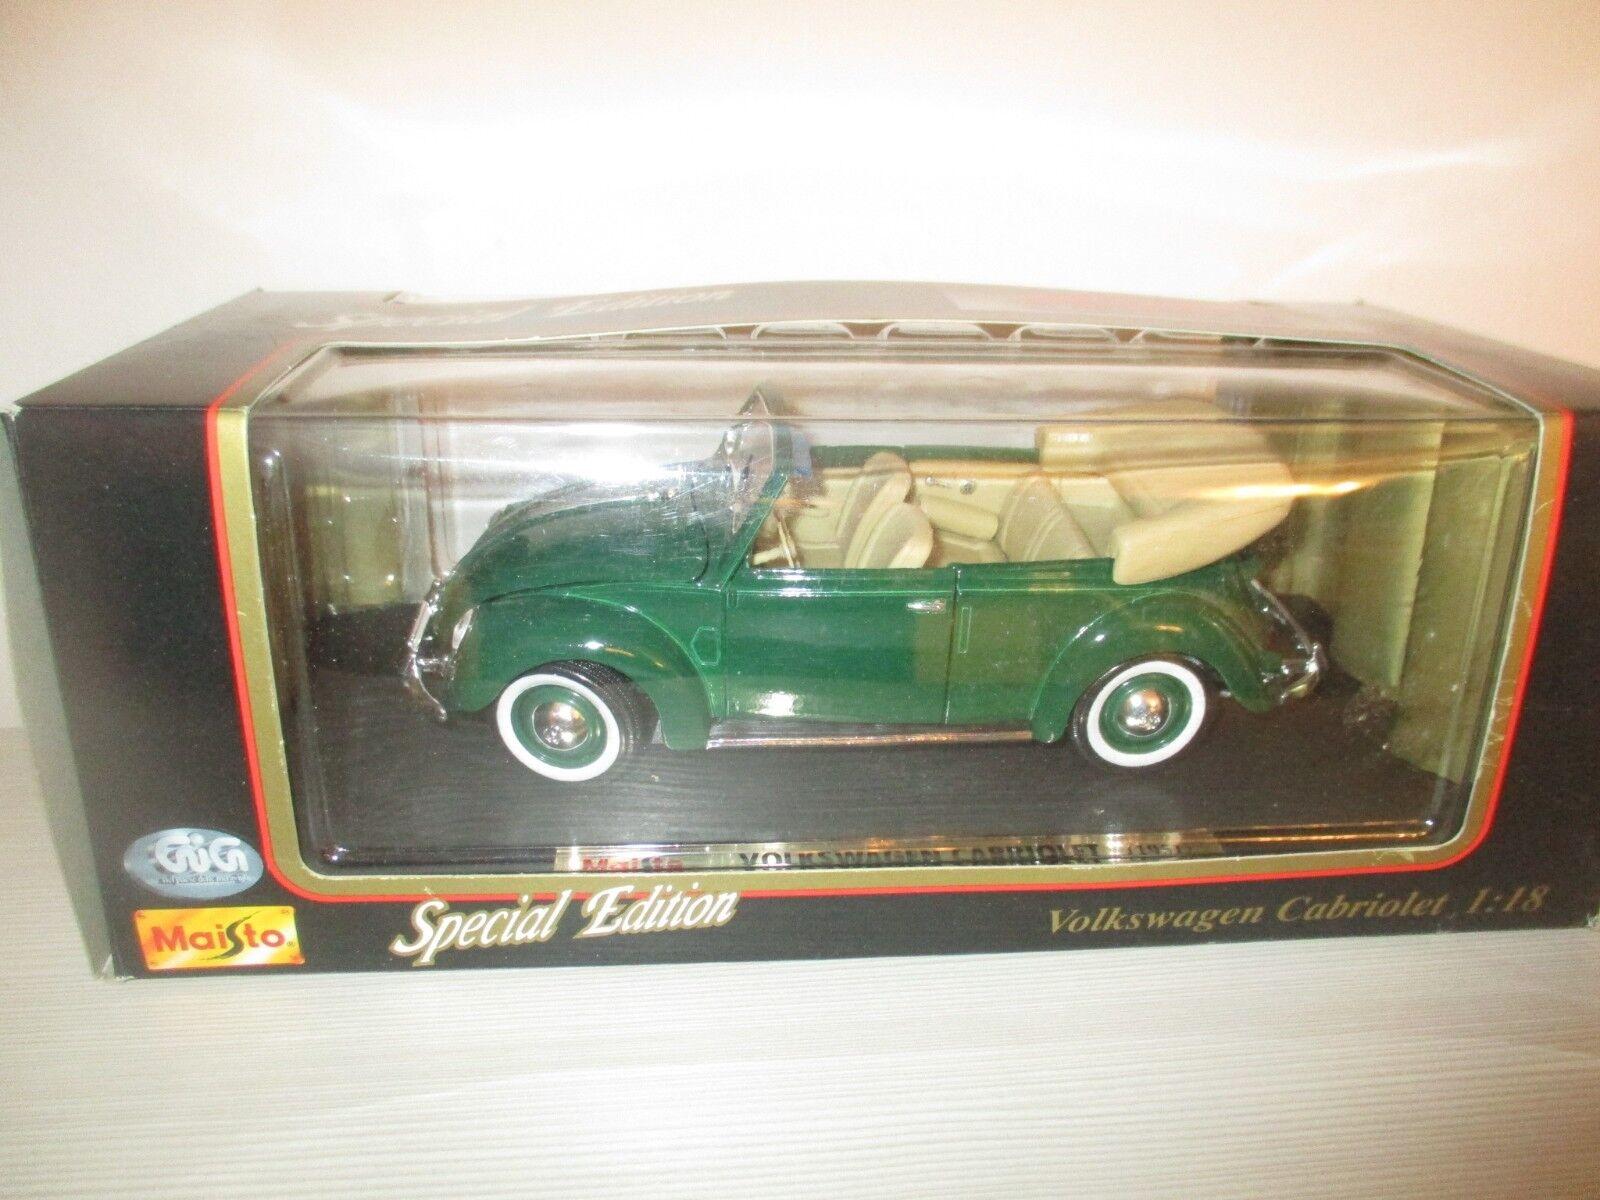 VOLKSWAGEN CABRIOLET 1951 SCALA 1 18 verde SCURO